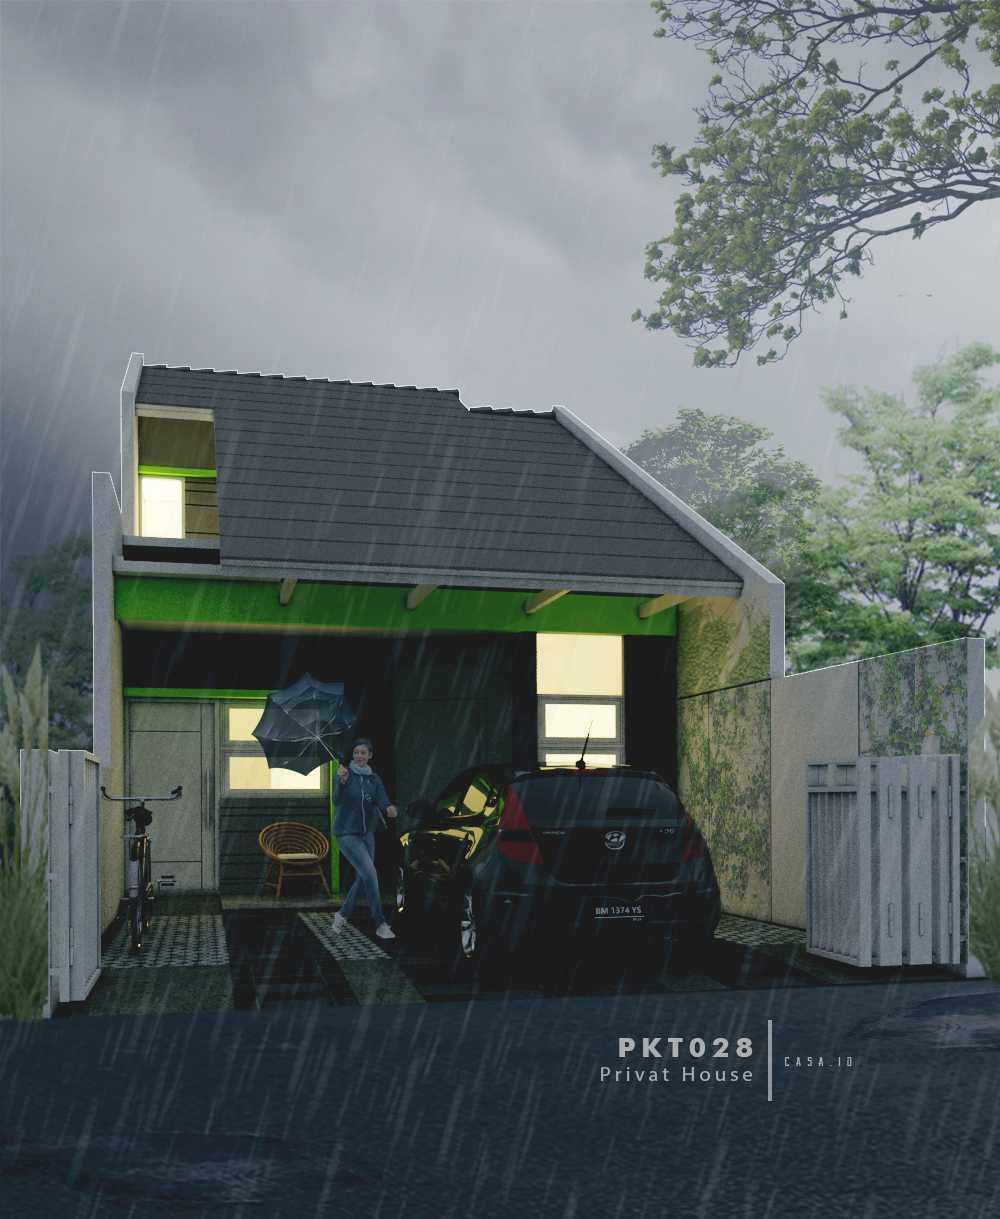 Casa.id Architecture & Design Pkt28 Kota Pekanbaru, Riau, Indonesia Kota Pekanbaru, Riau, Indonesia Exterior View Tropical  40550